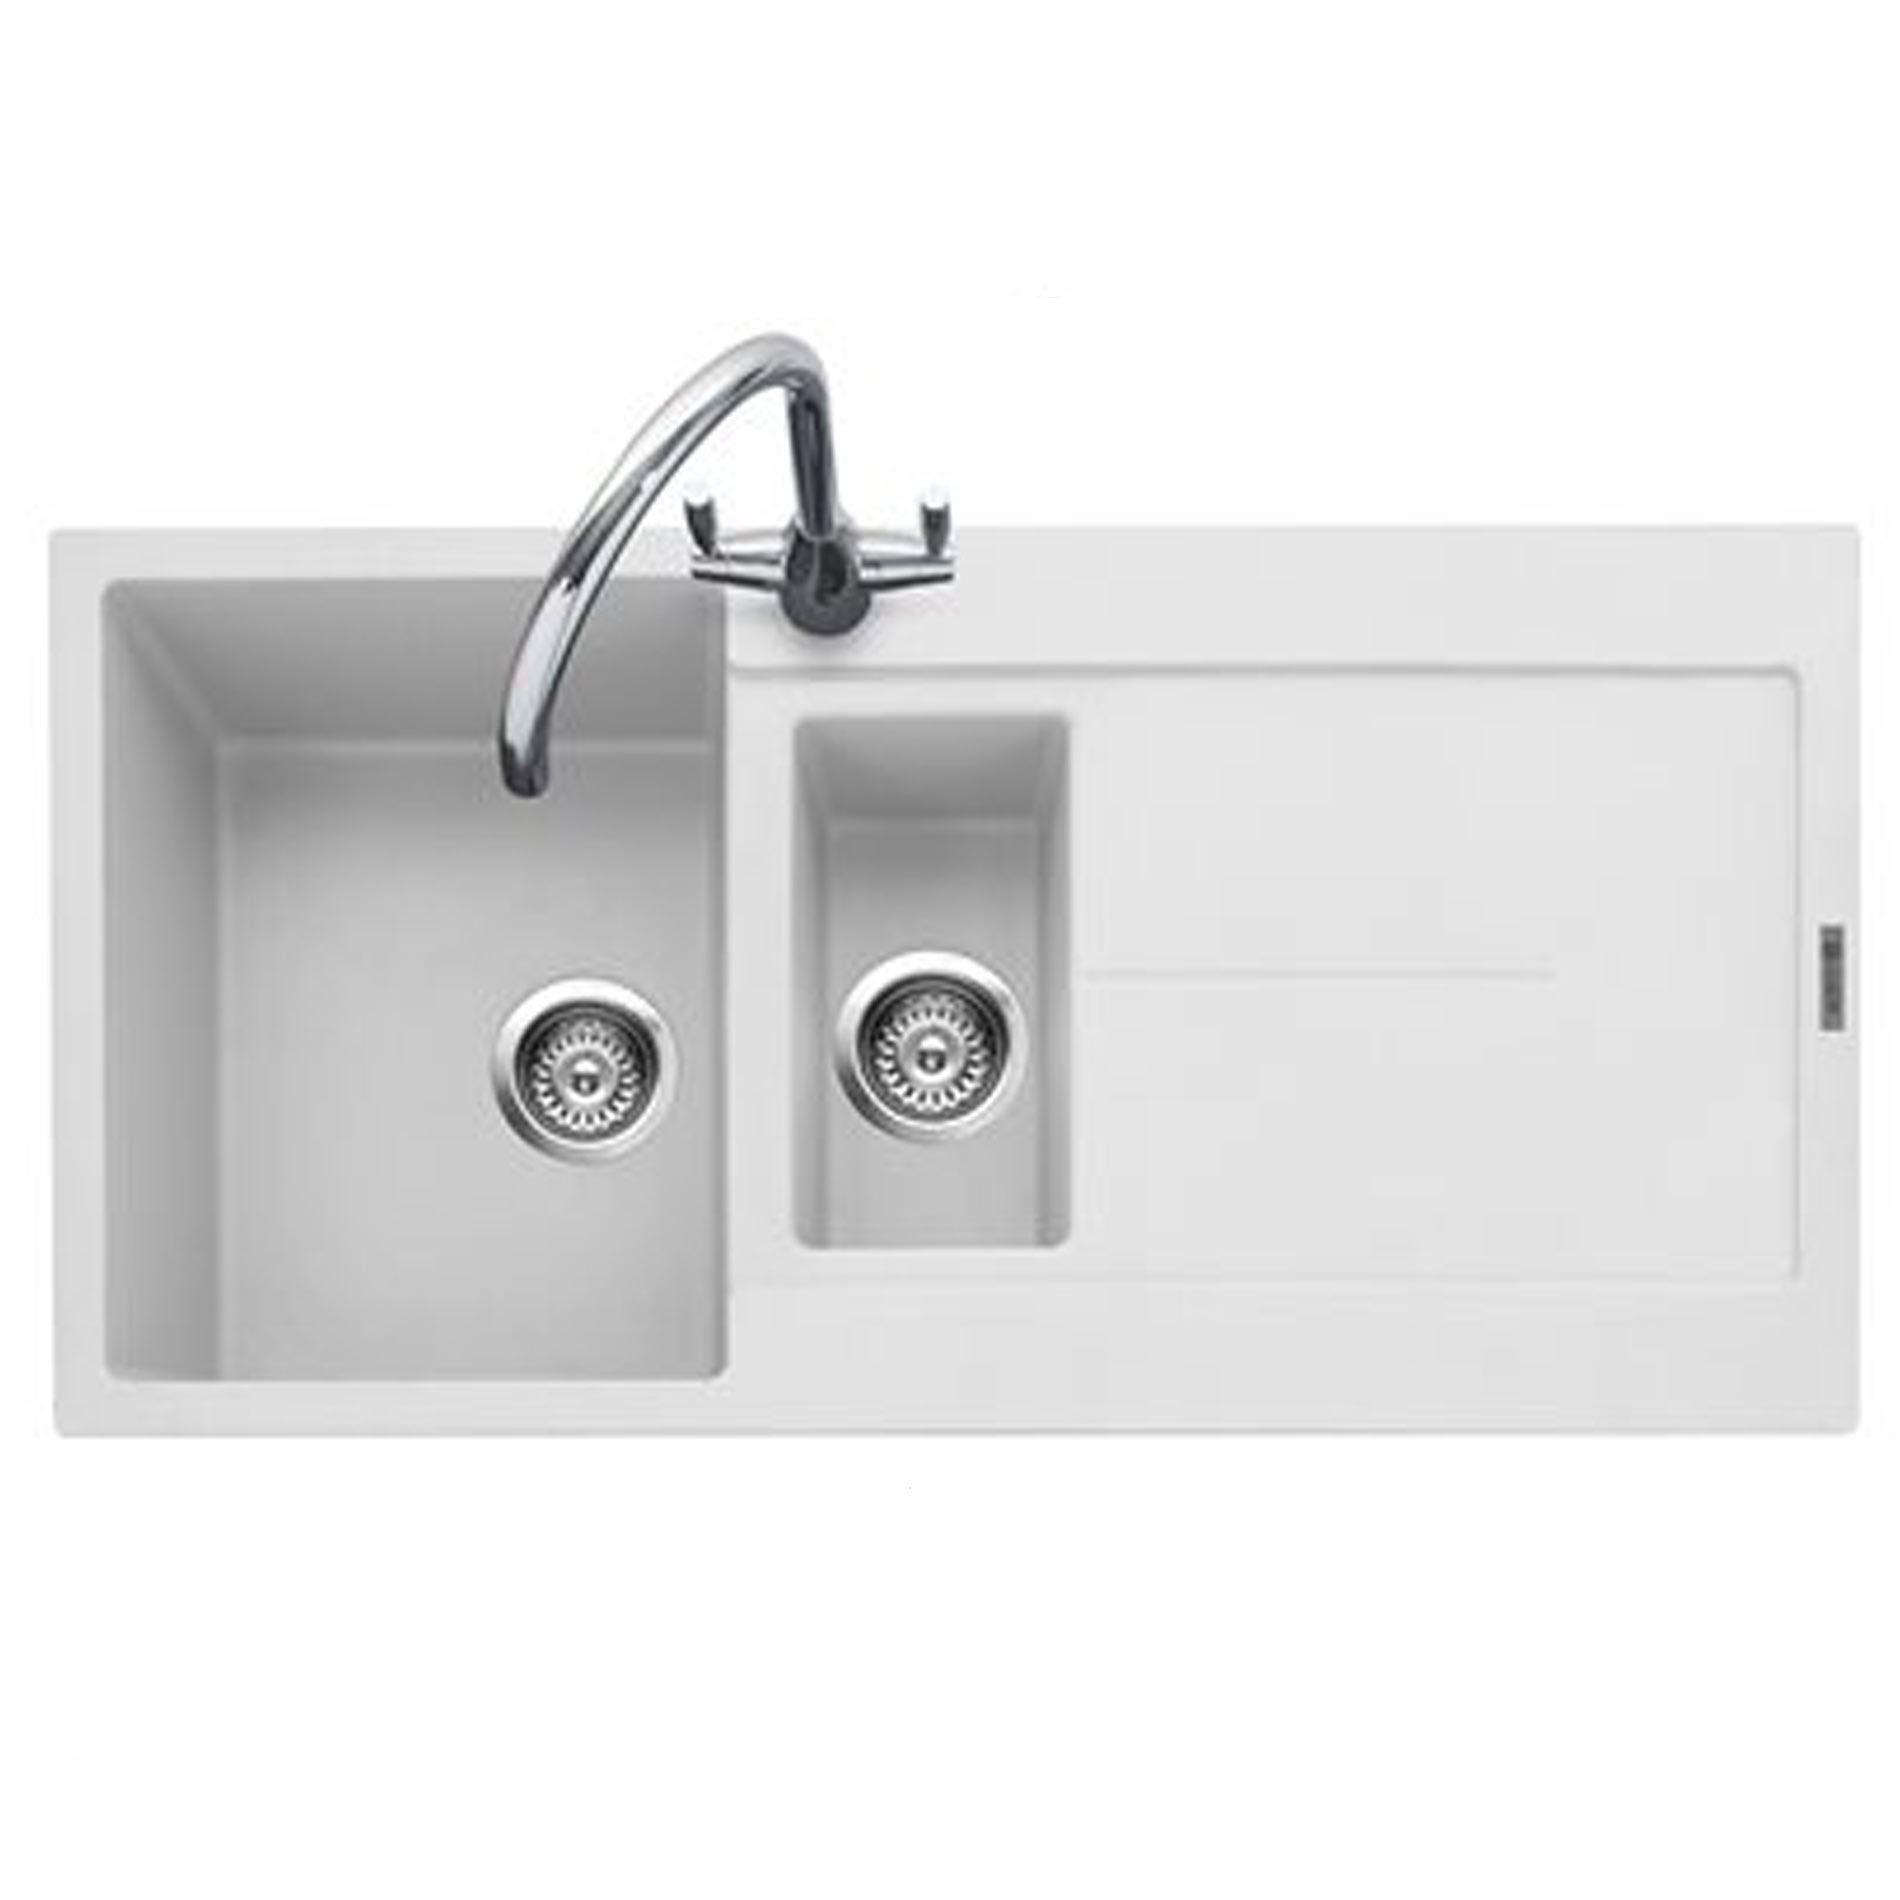 Granite Sink White : Caple: Canis 150 Chalk White Granite Sink - Kitchen Sinks & Taps